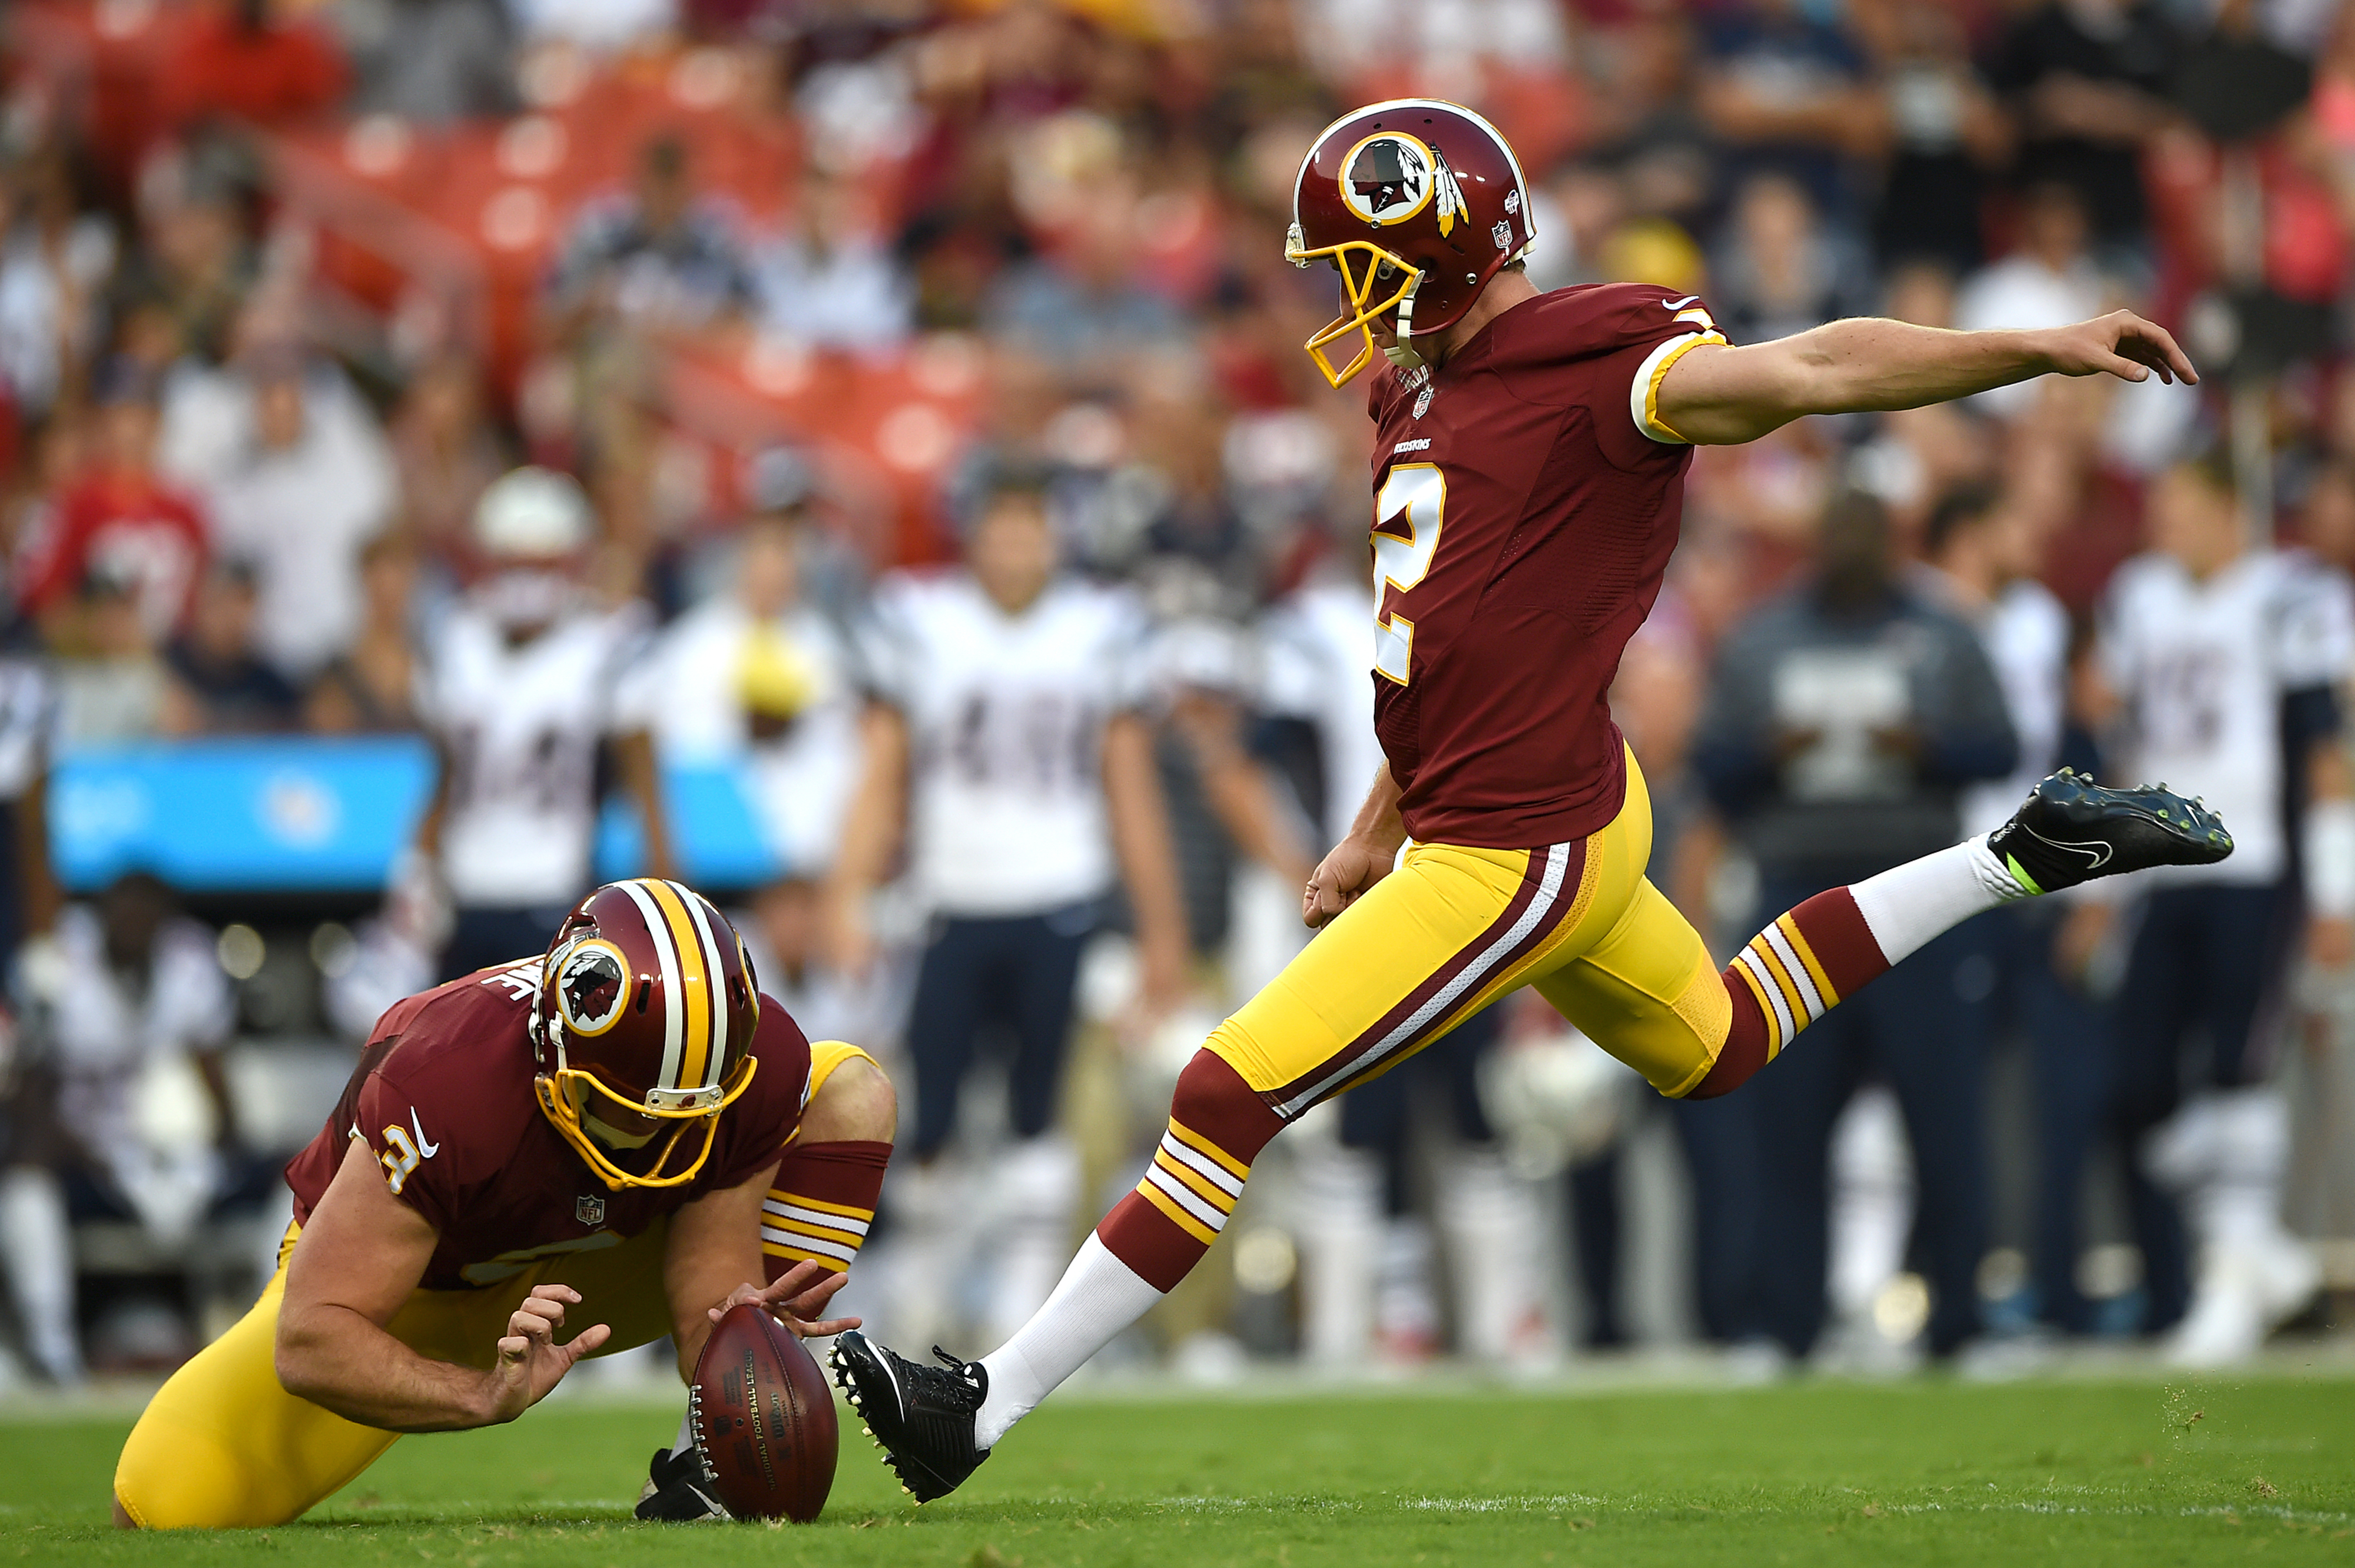 Kai Forbath vs Zach Hocker: The Fight to be the Washington Redskins Kicker in 2014